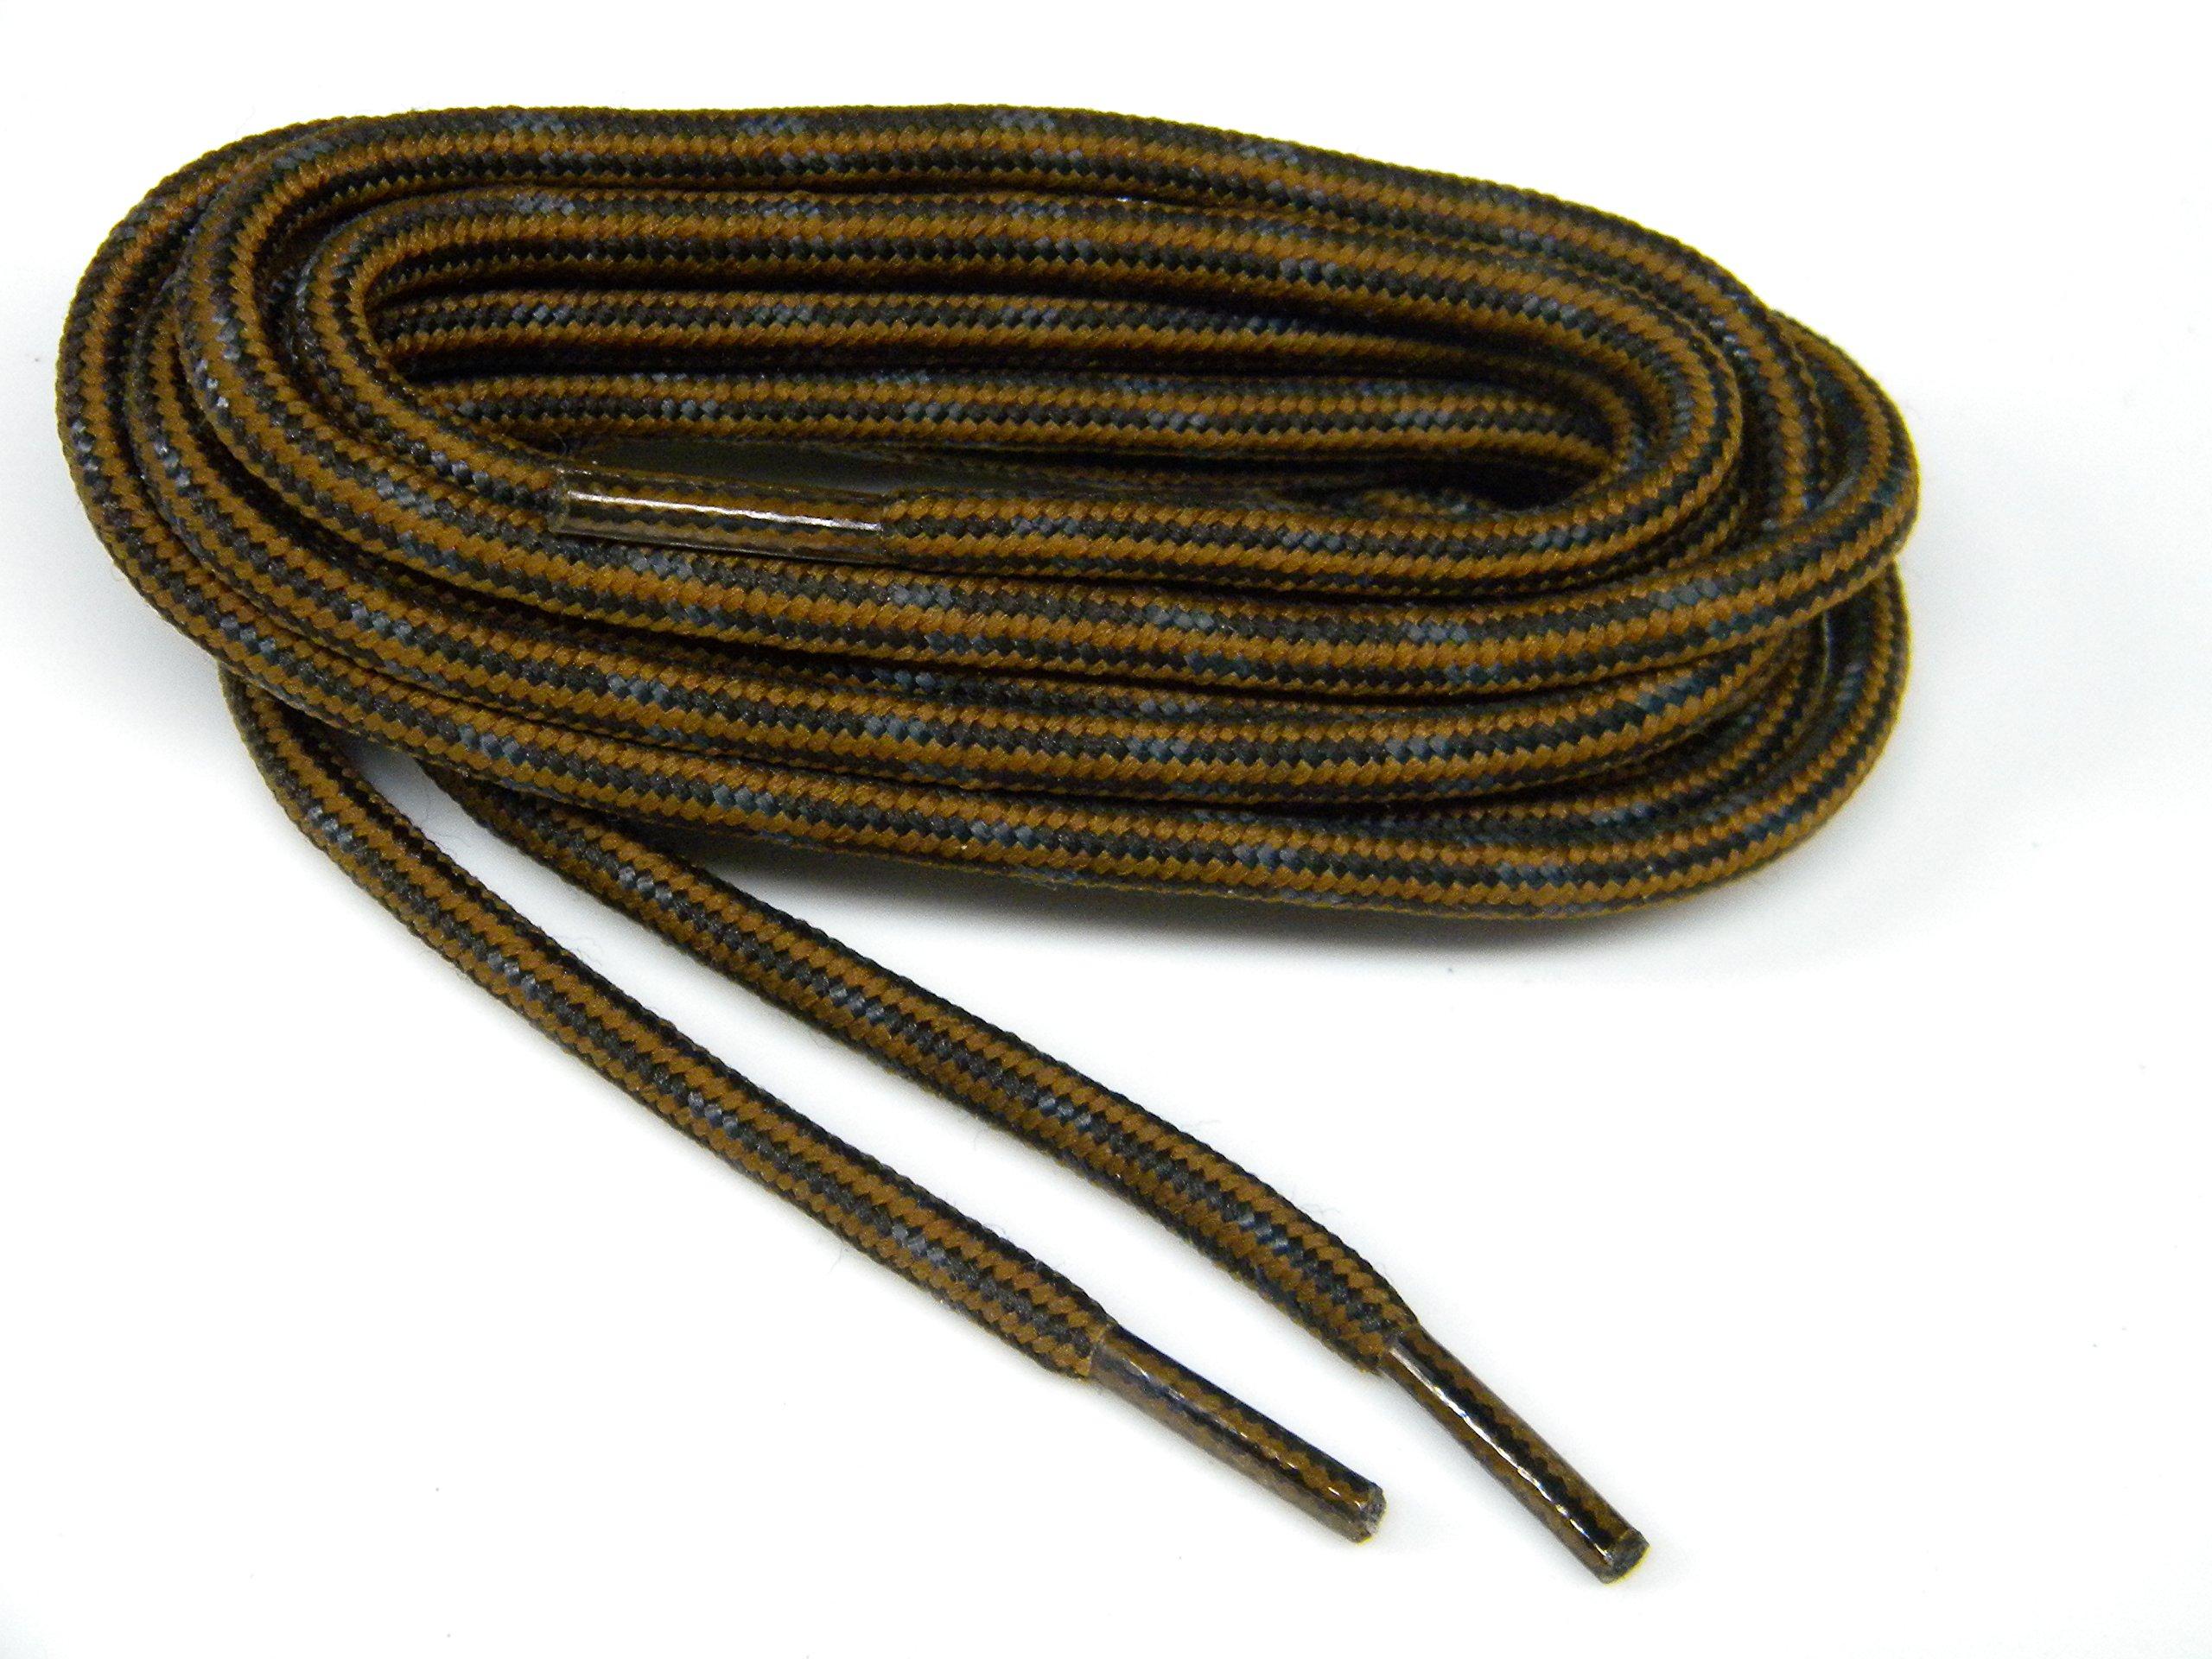 GREATLACES 63 inch Rust w/Black Kevlar (R) proTOUGH(TM) Boot Shoelaces 2 Pair Pack